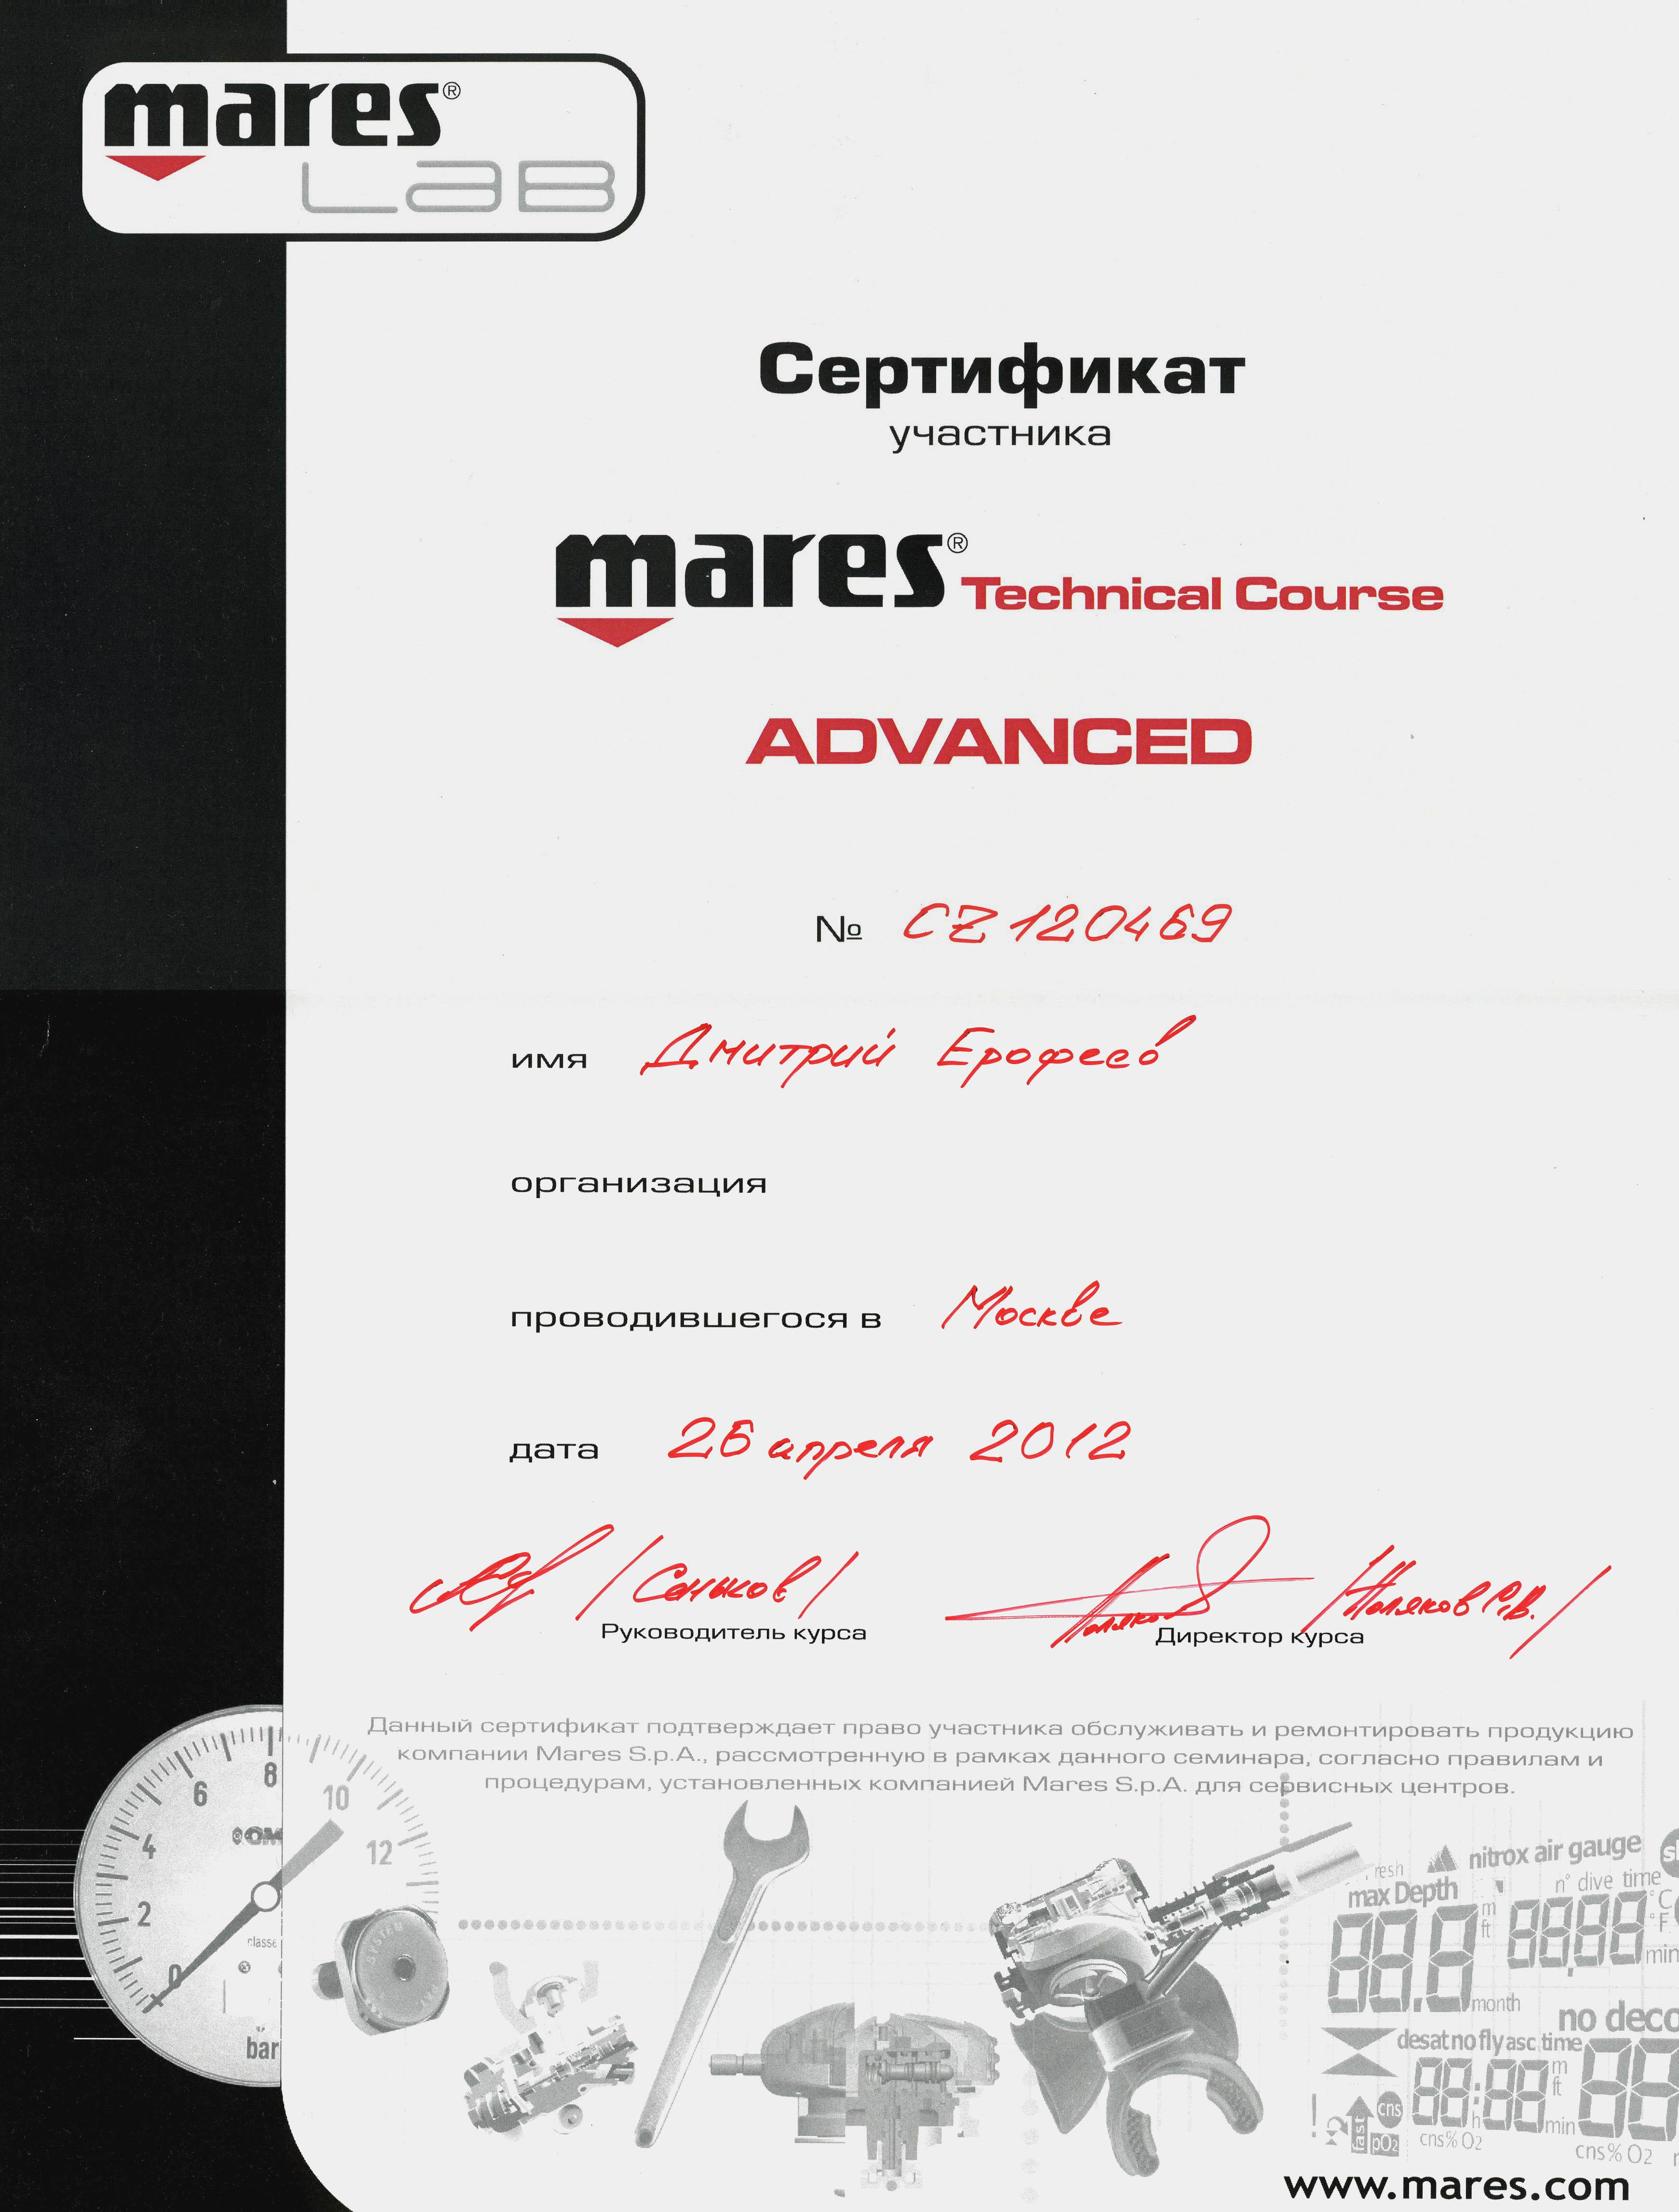 Сертификат Mares